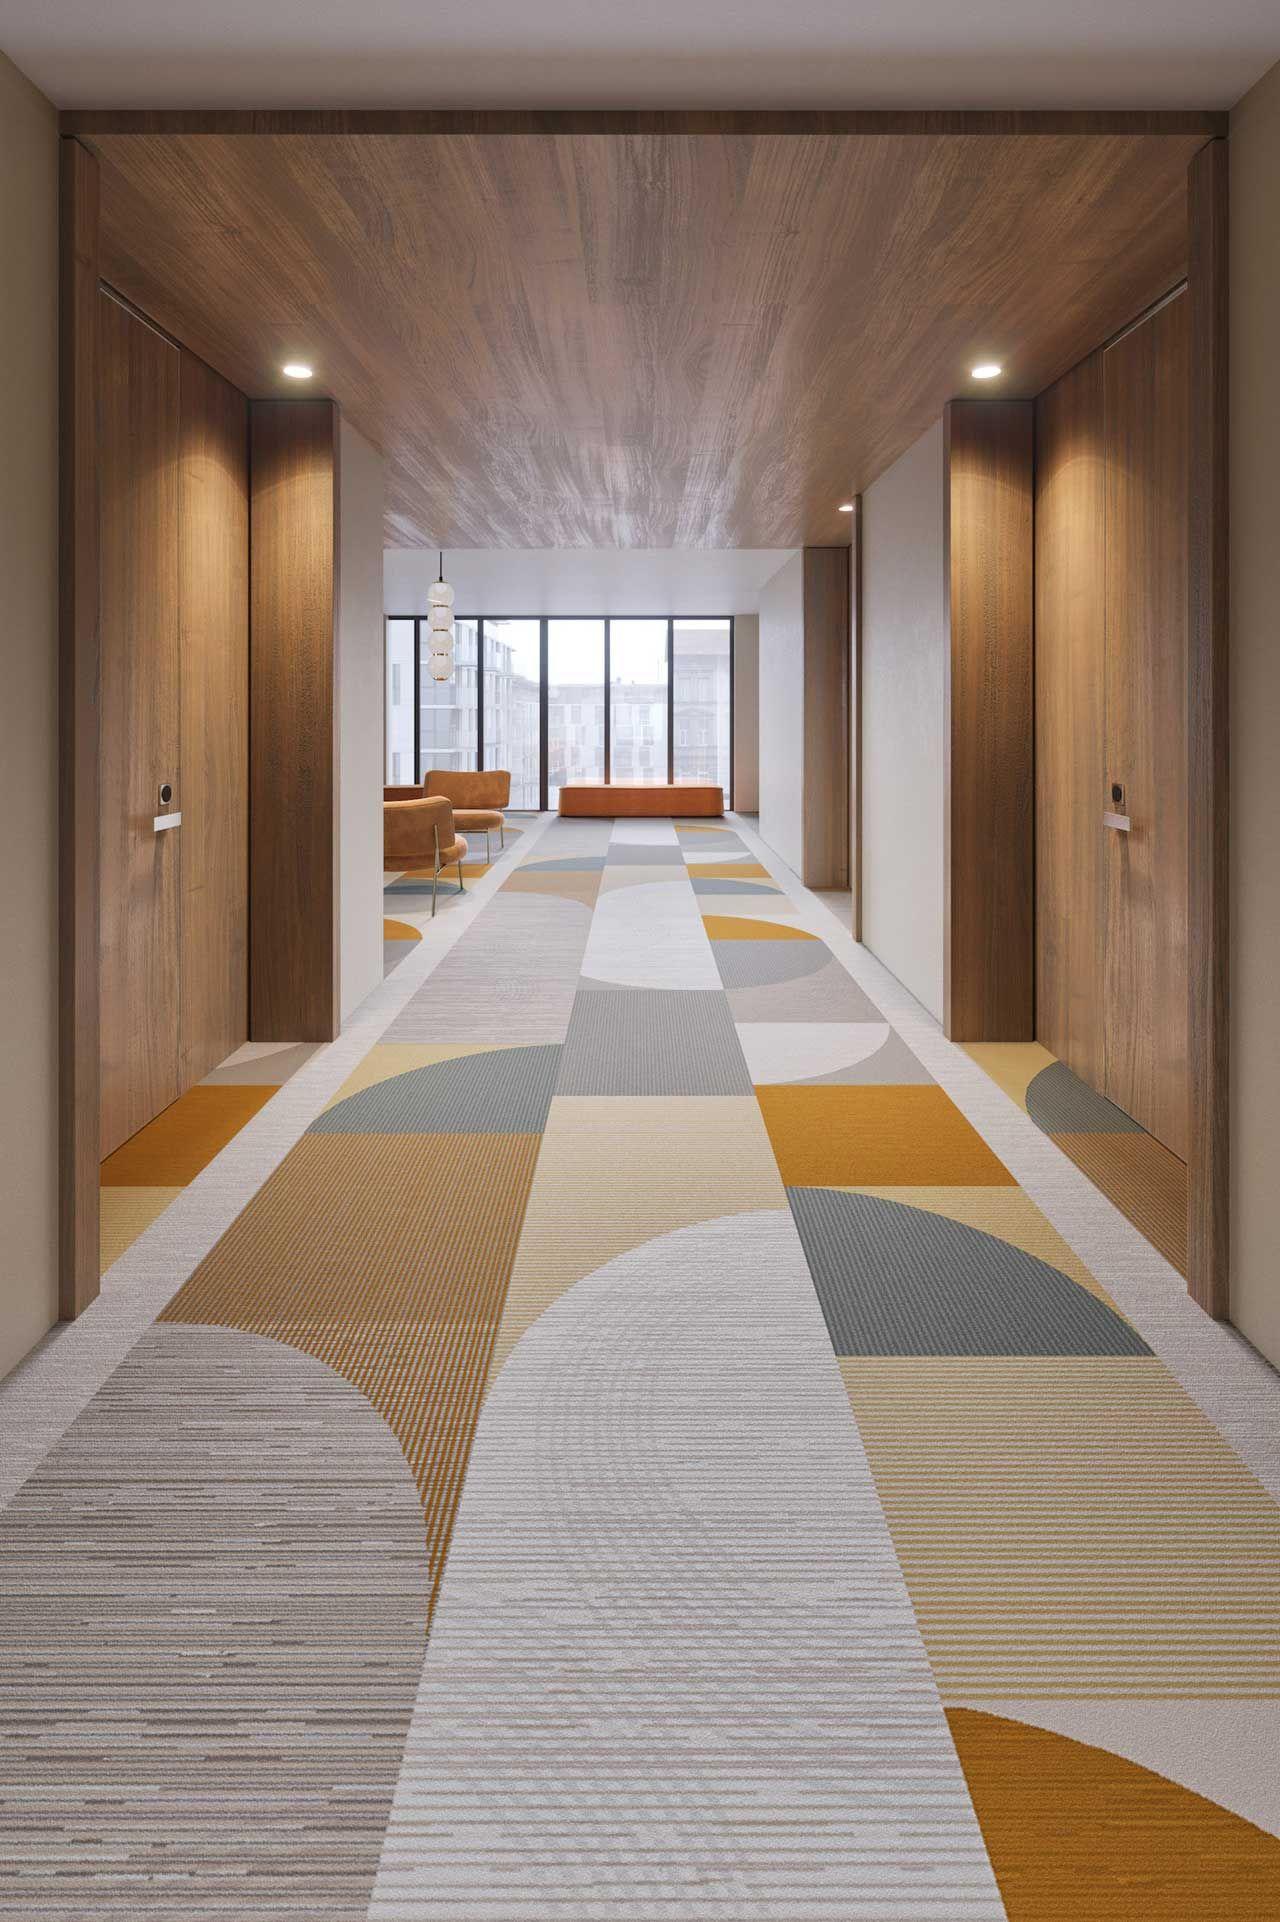 Tarkett Introduces nowHAUS: A Bauhaus-Inspired Flooring Collection